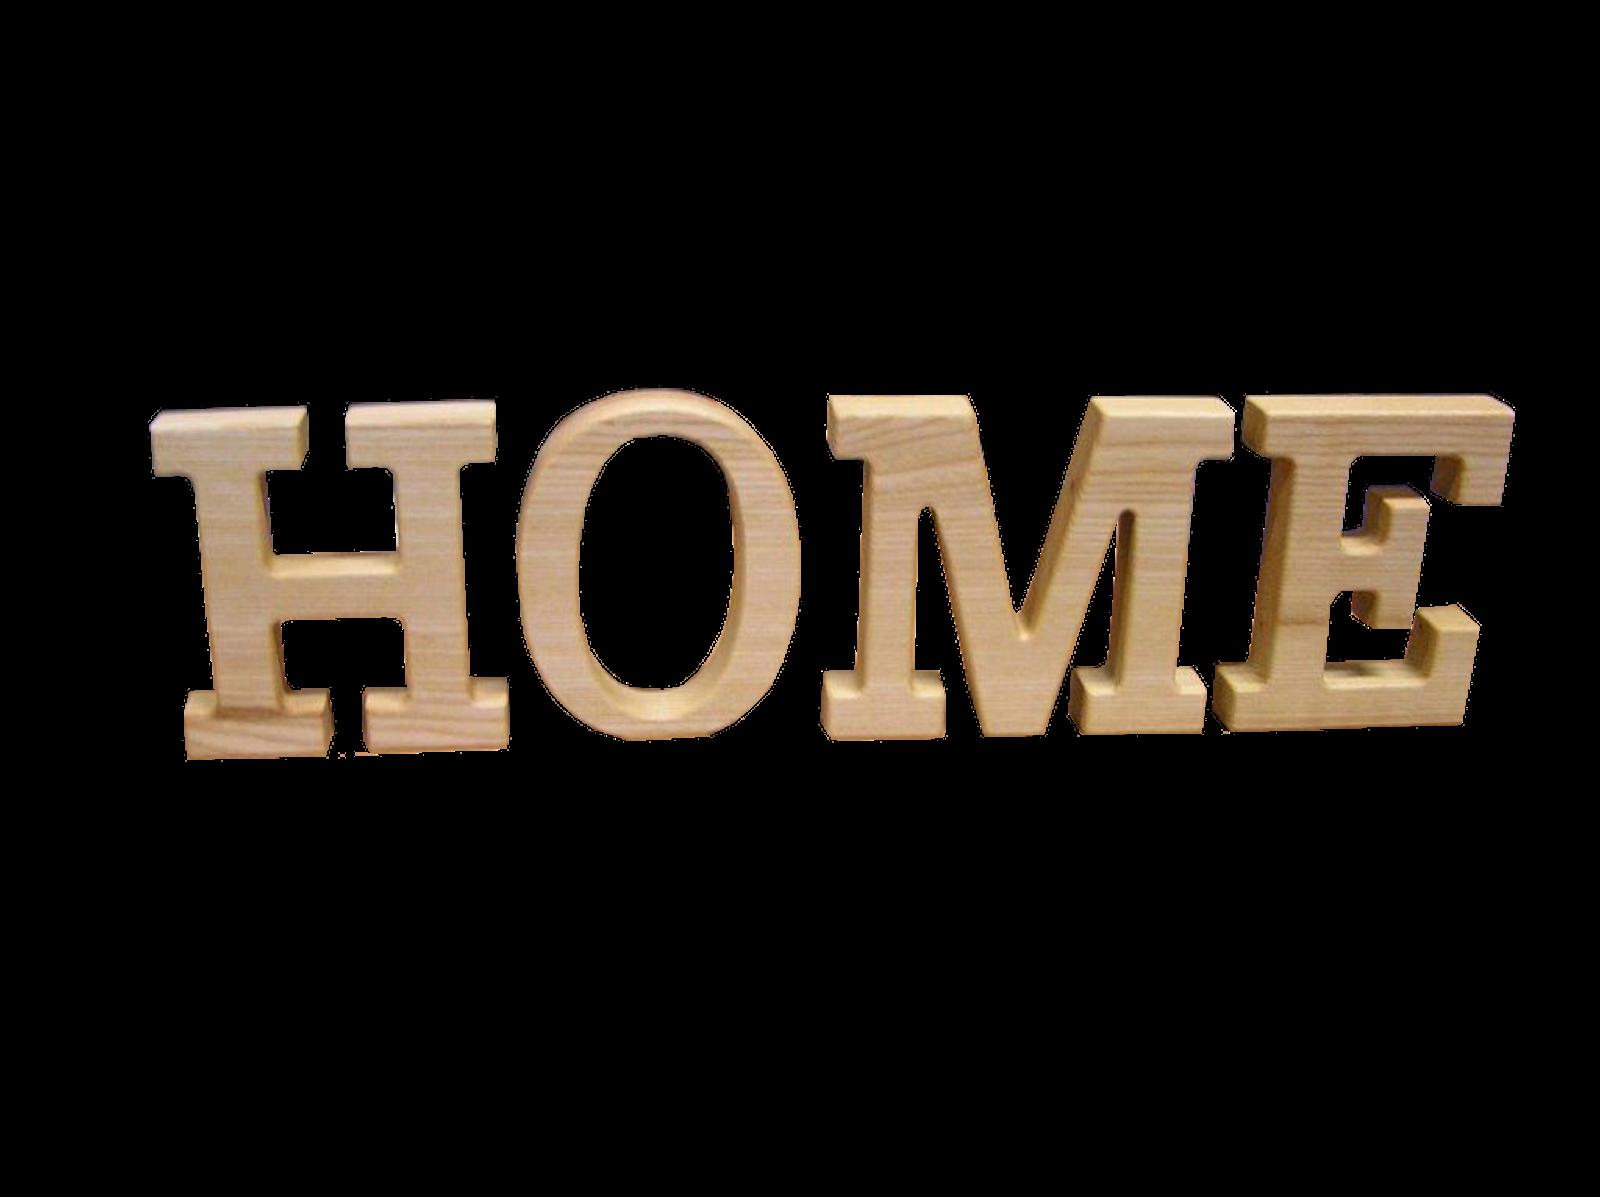 deko schriftzug. Black Bedroom Furniture Sets. Home Design Ideas